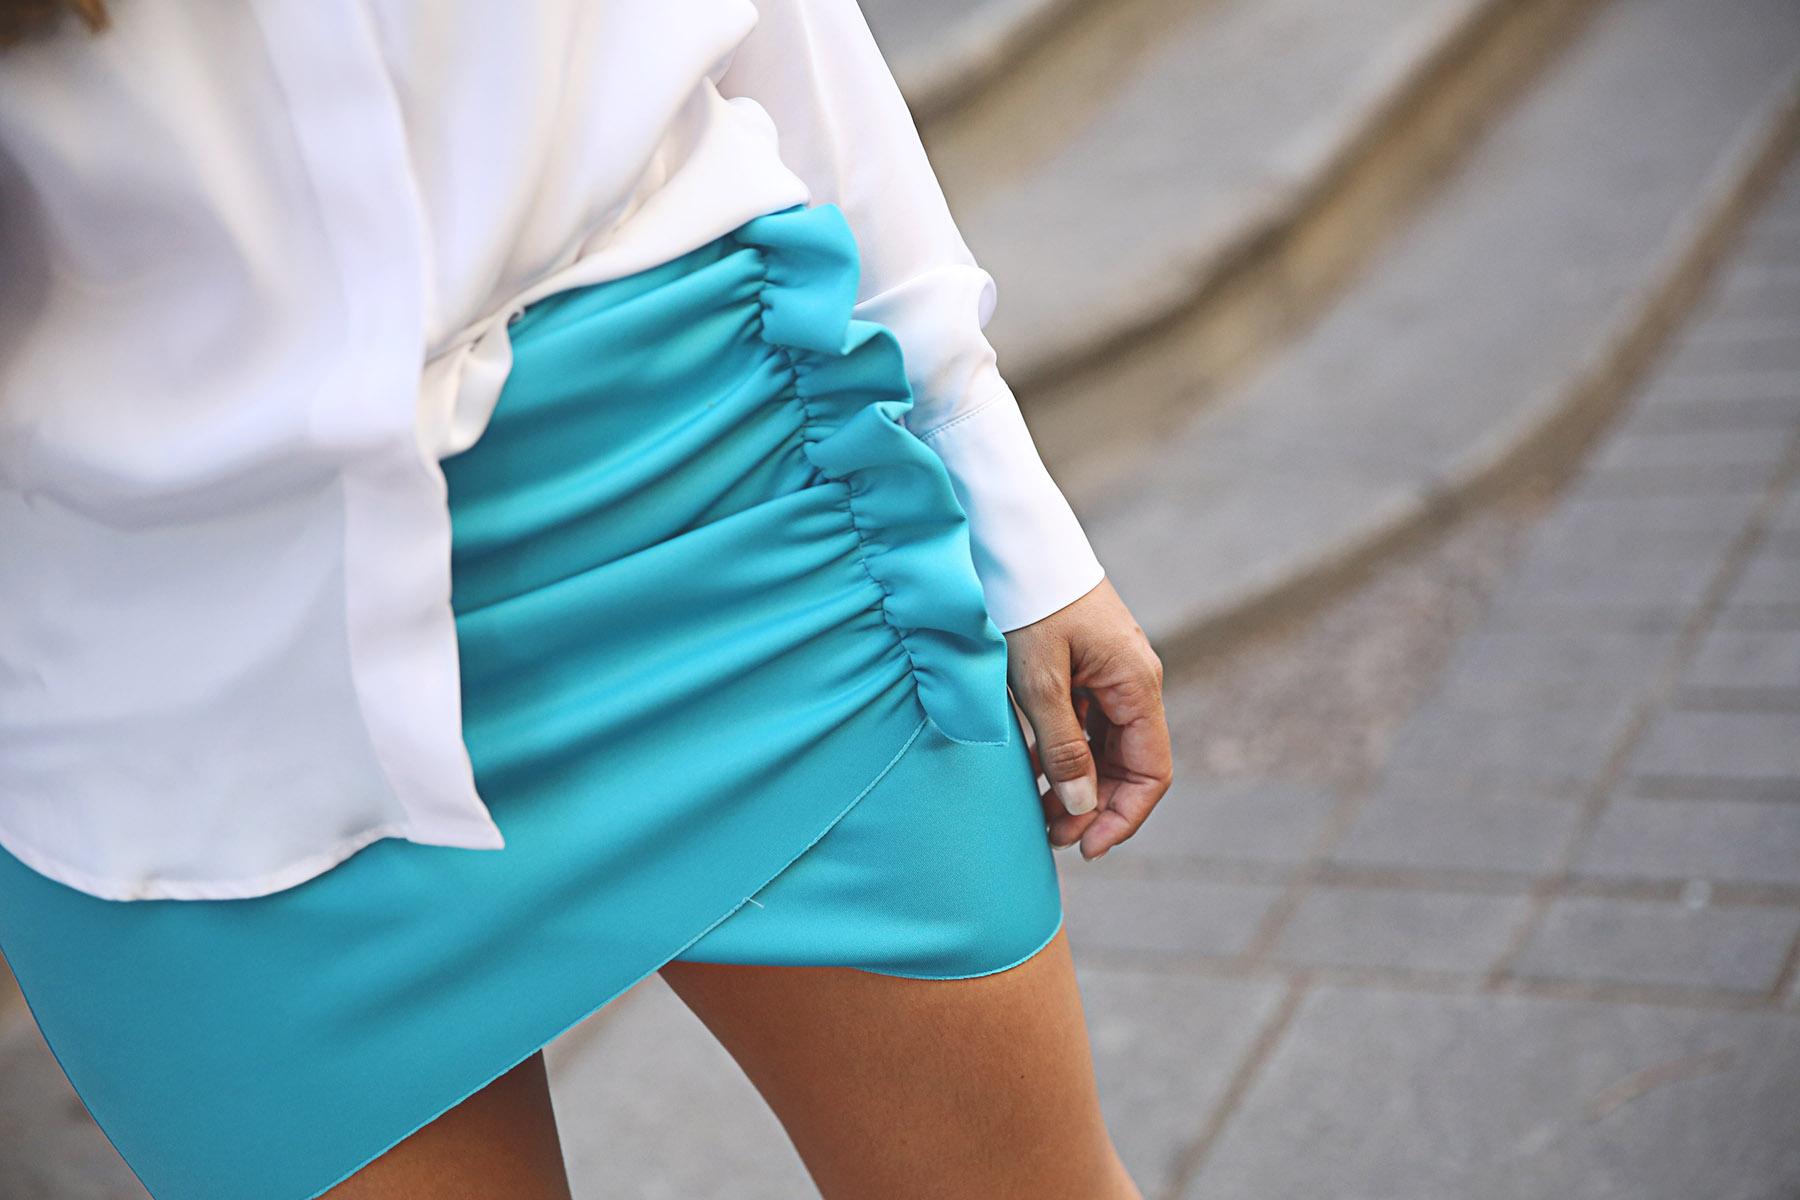 trendy-taste-look-outfit-street-style-ootd-blog-blogger-fashion-spain-moda-españa-lolali-blue-neopreno-azul-falda-blusa-bcbg-338-sandalias-serpiente-1